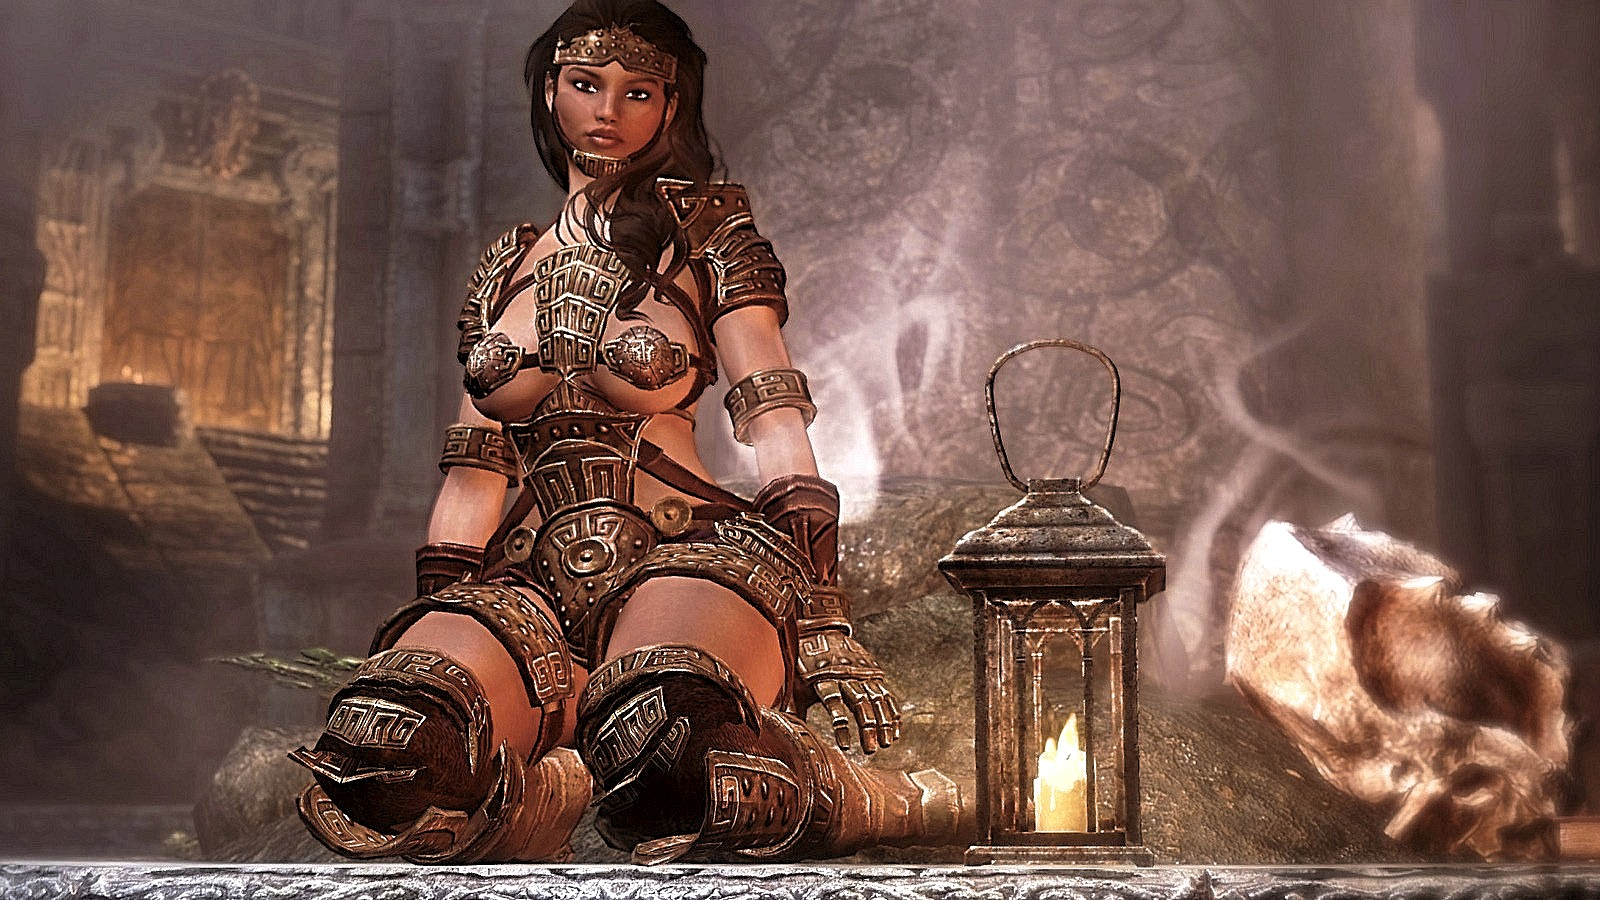 1.jpg - Elder Scrolls 5: Skyrim, the